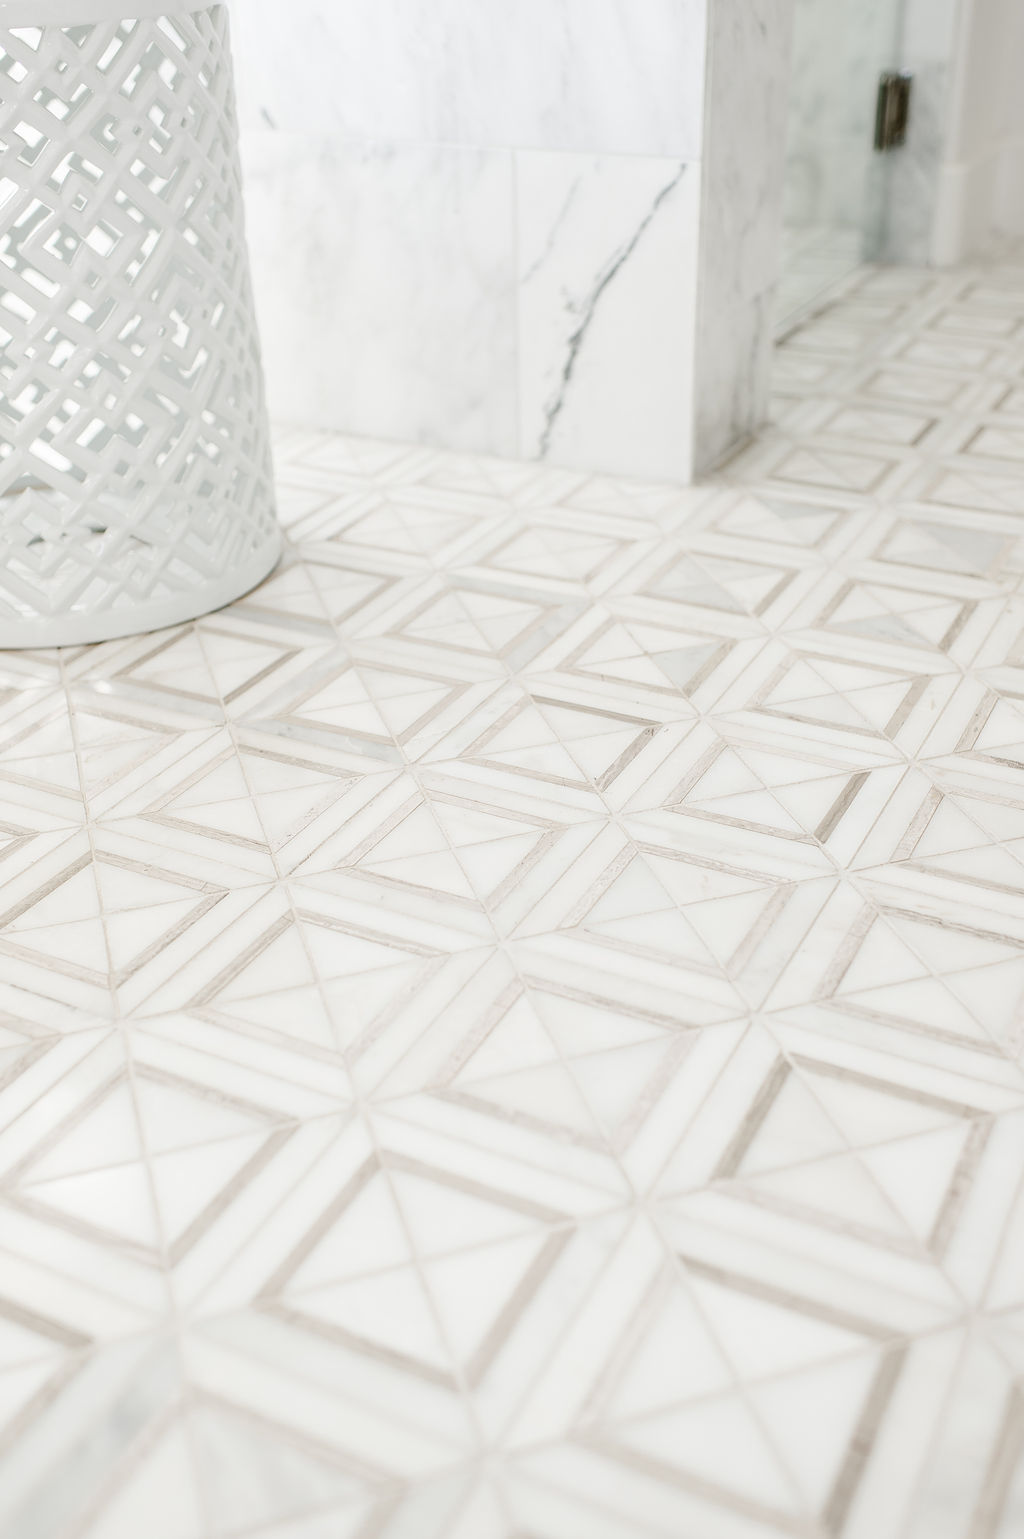 hill-country-transitional-clark-design-studio-master-bathroom-marble-tile.jpg